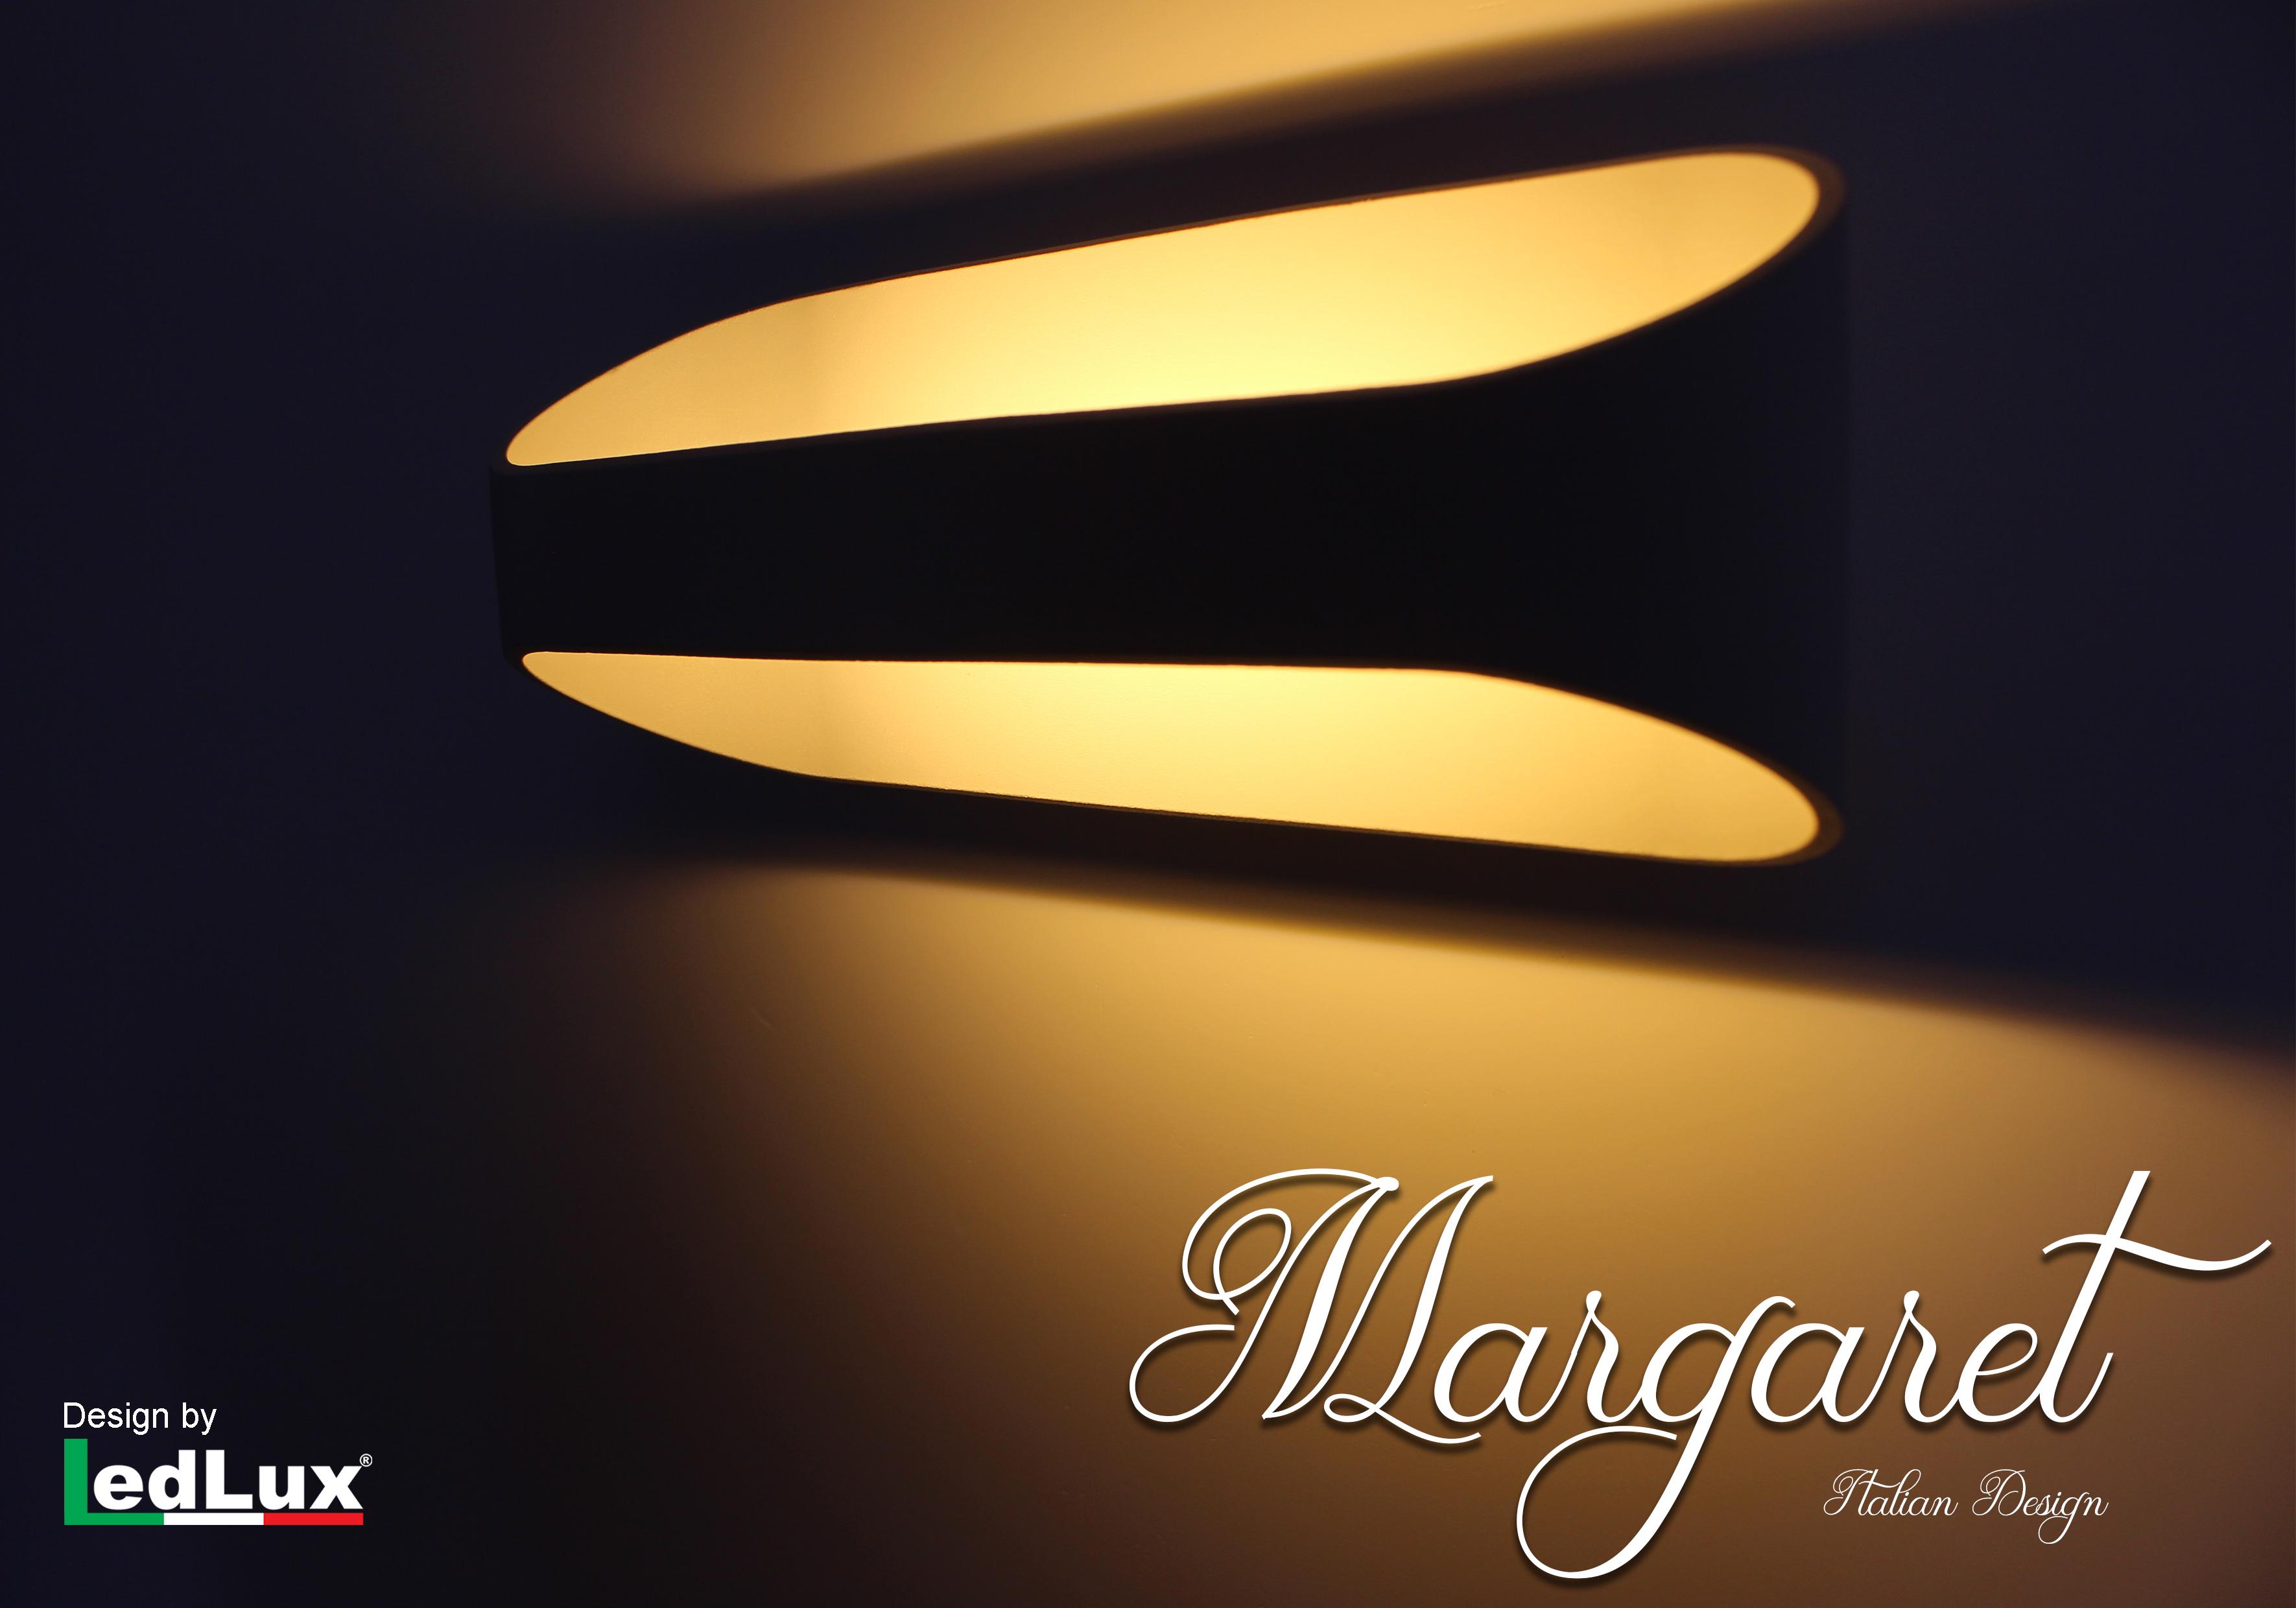 Applique Led Da Parete Modello Margaret Italian Design Moderna 10W Bianco Caldo - PZ